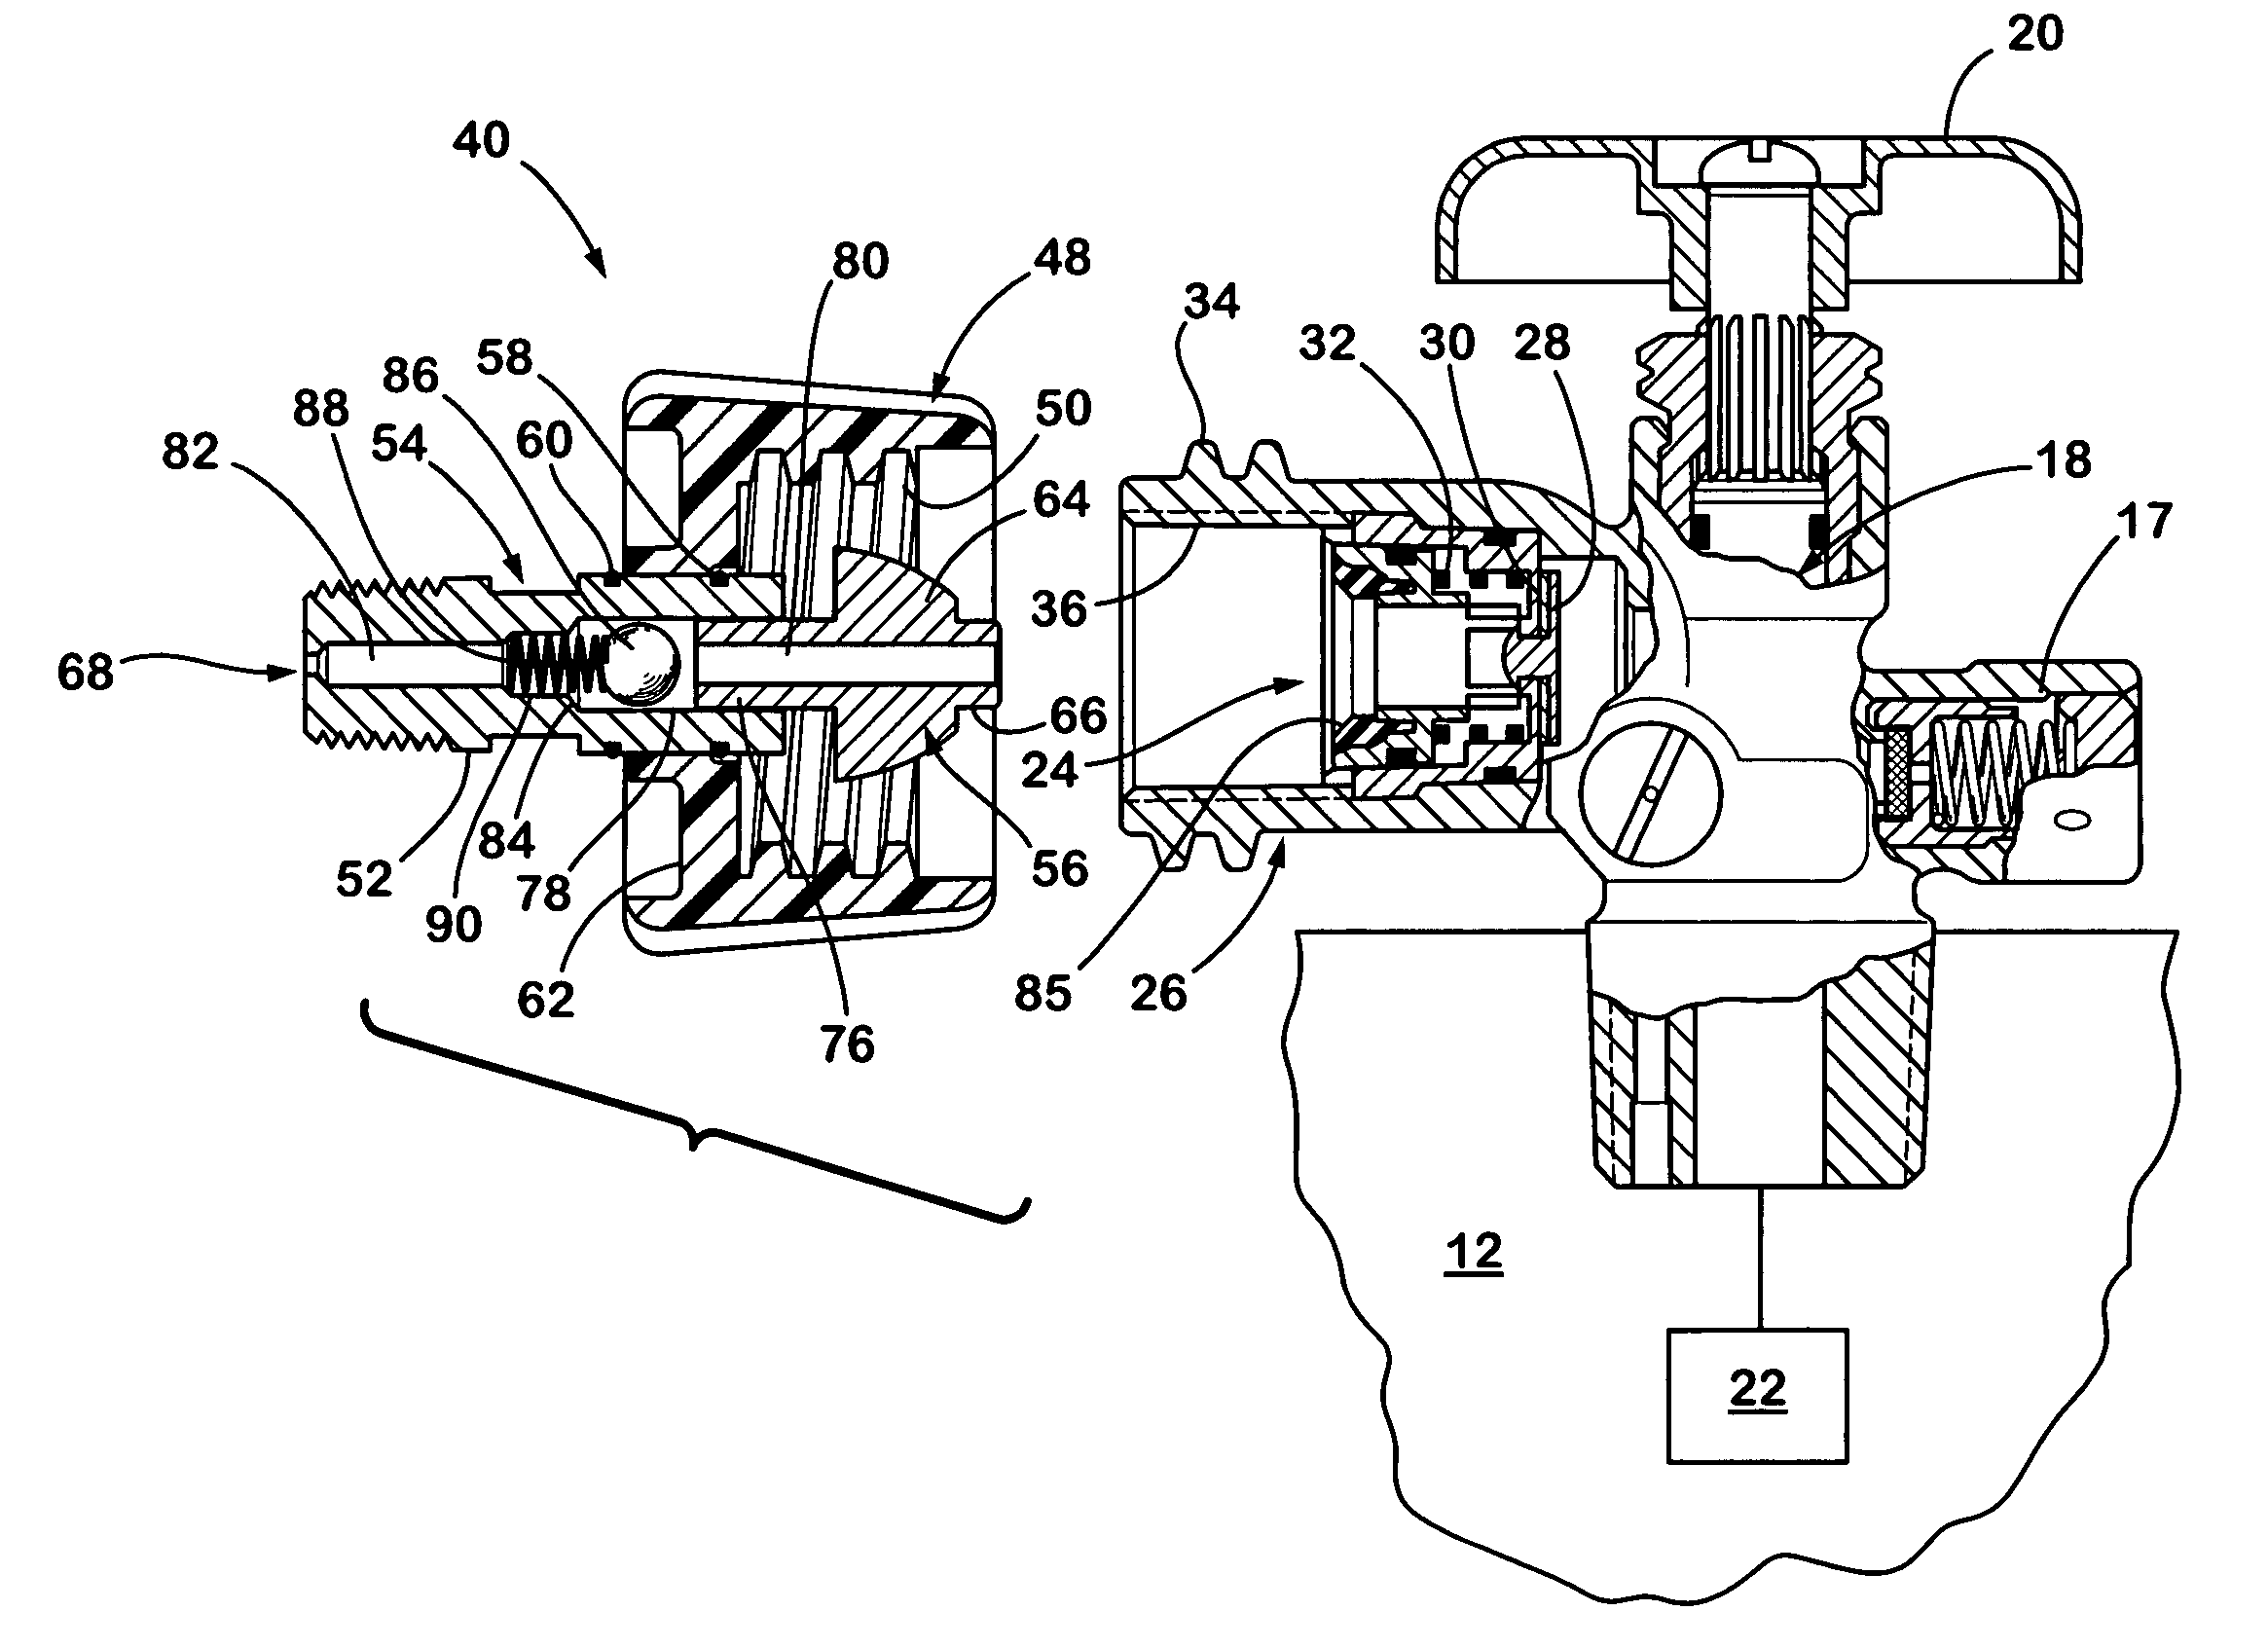 forklift schematic diagram forklift line drawing   elsavadorla AC Plug Wiring Diagram Home AC Wiring Diagram